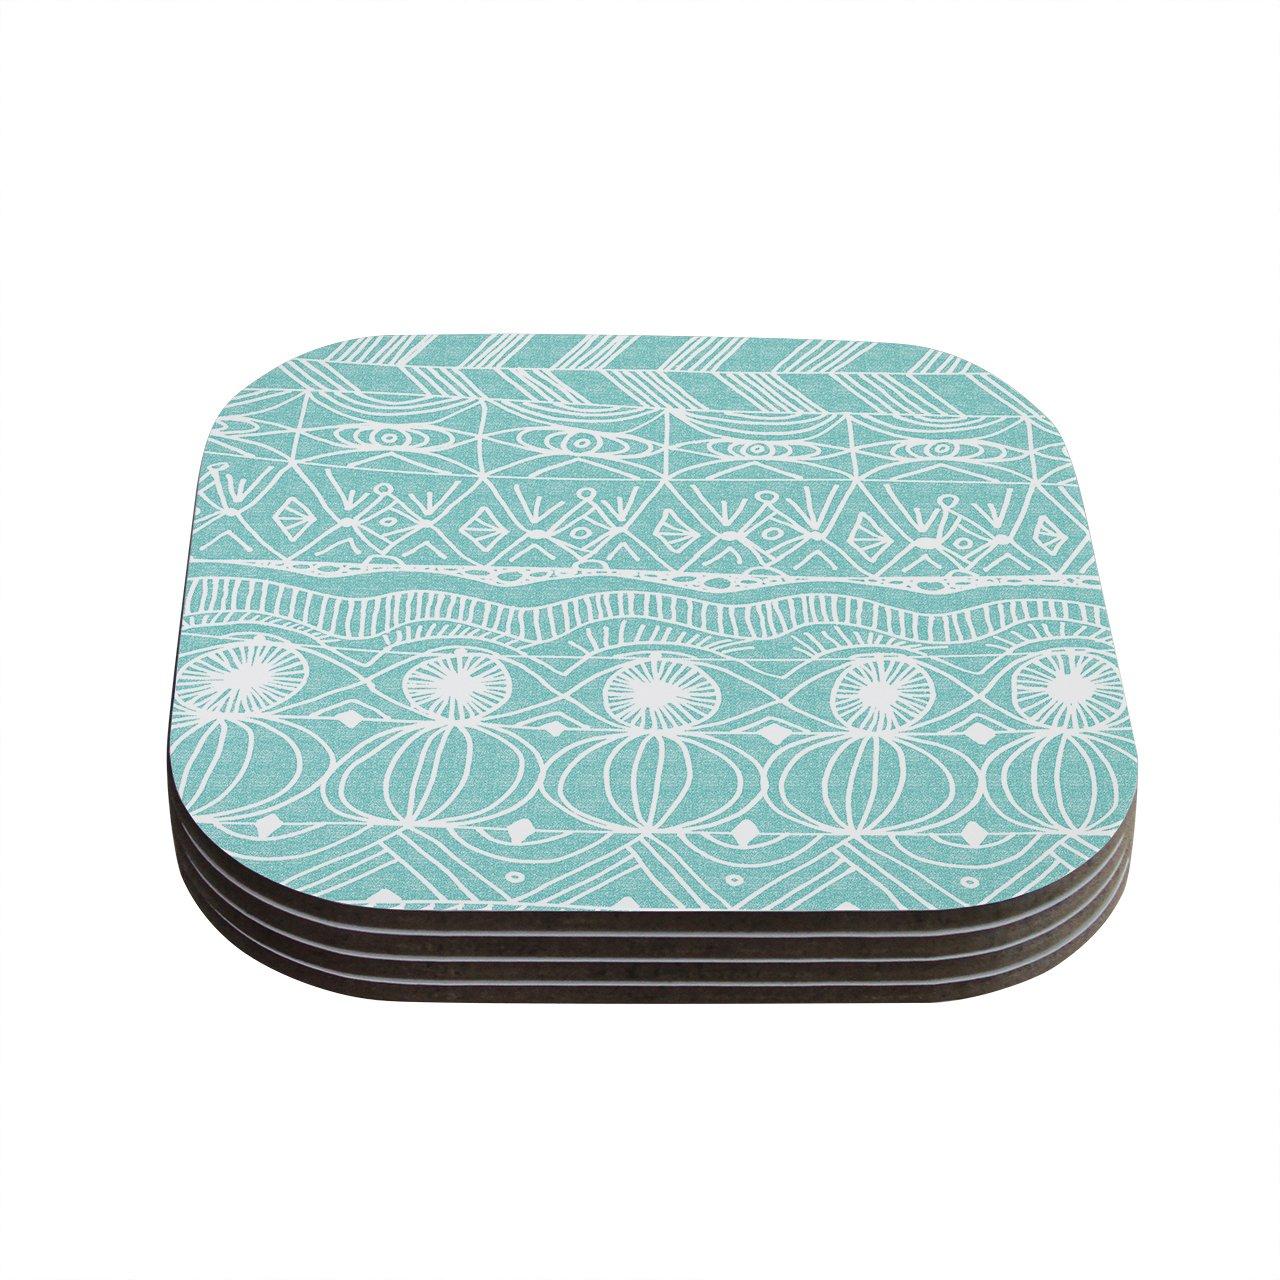 Kess InHouse Catherine Holcombe''Beach Blanket Bingo'' Coasters, 4 by 4-Inch, Teal/White, Set of 4